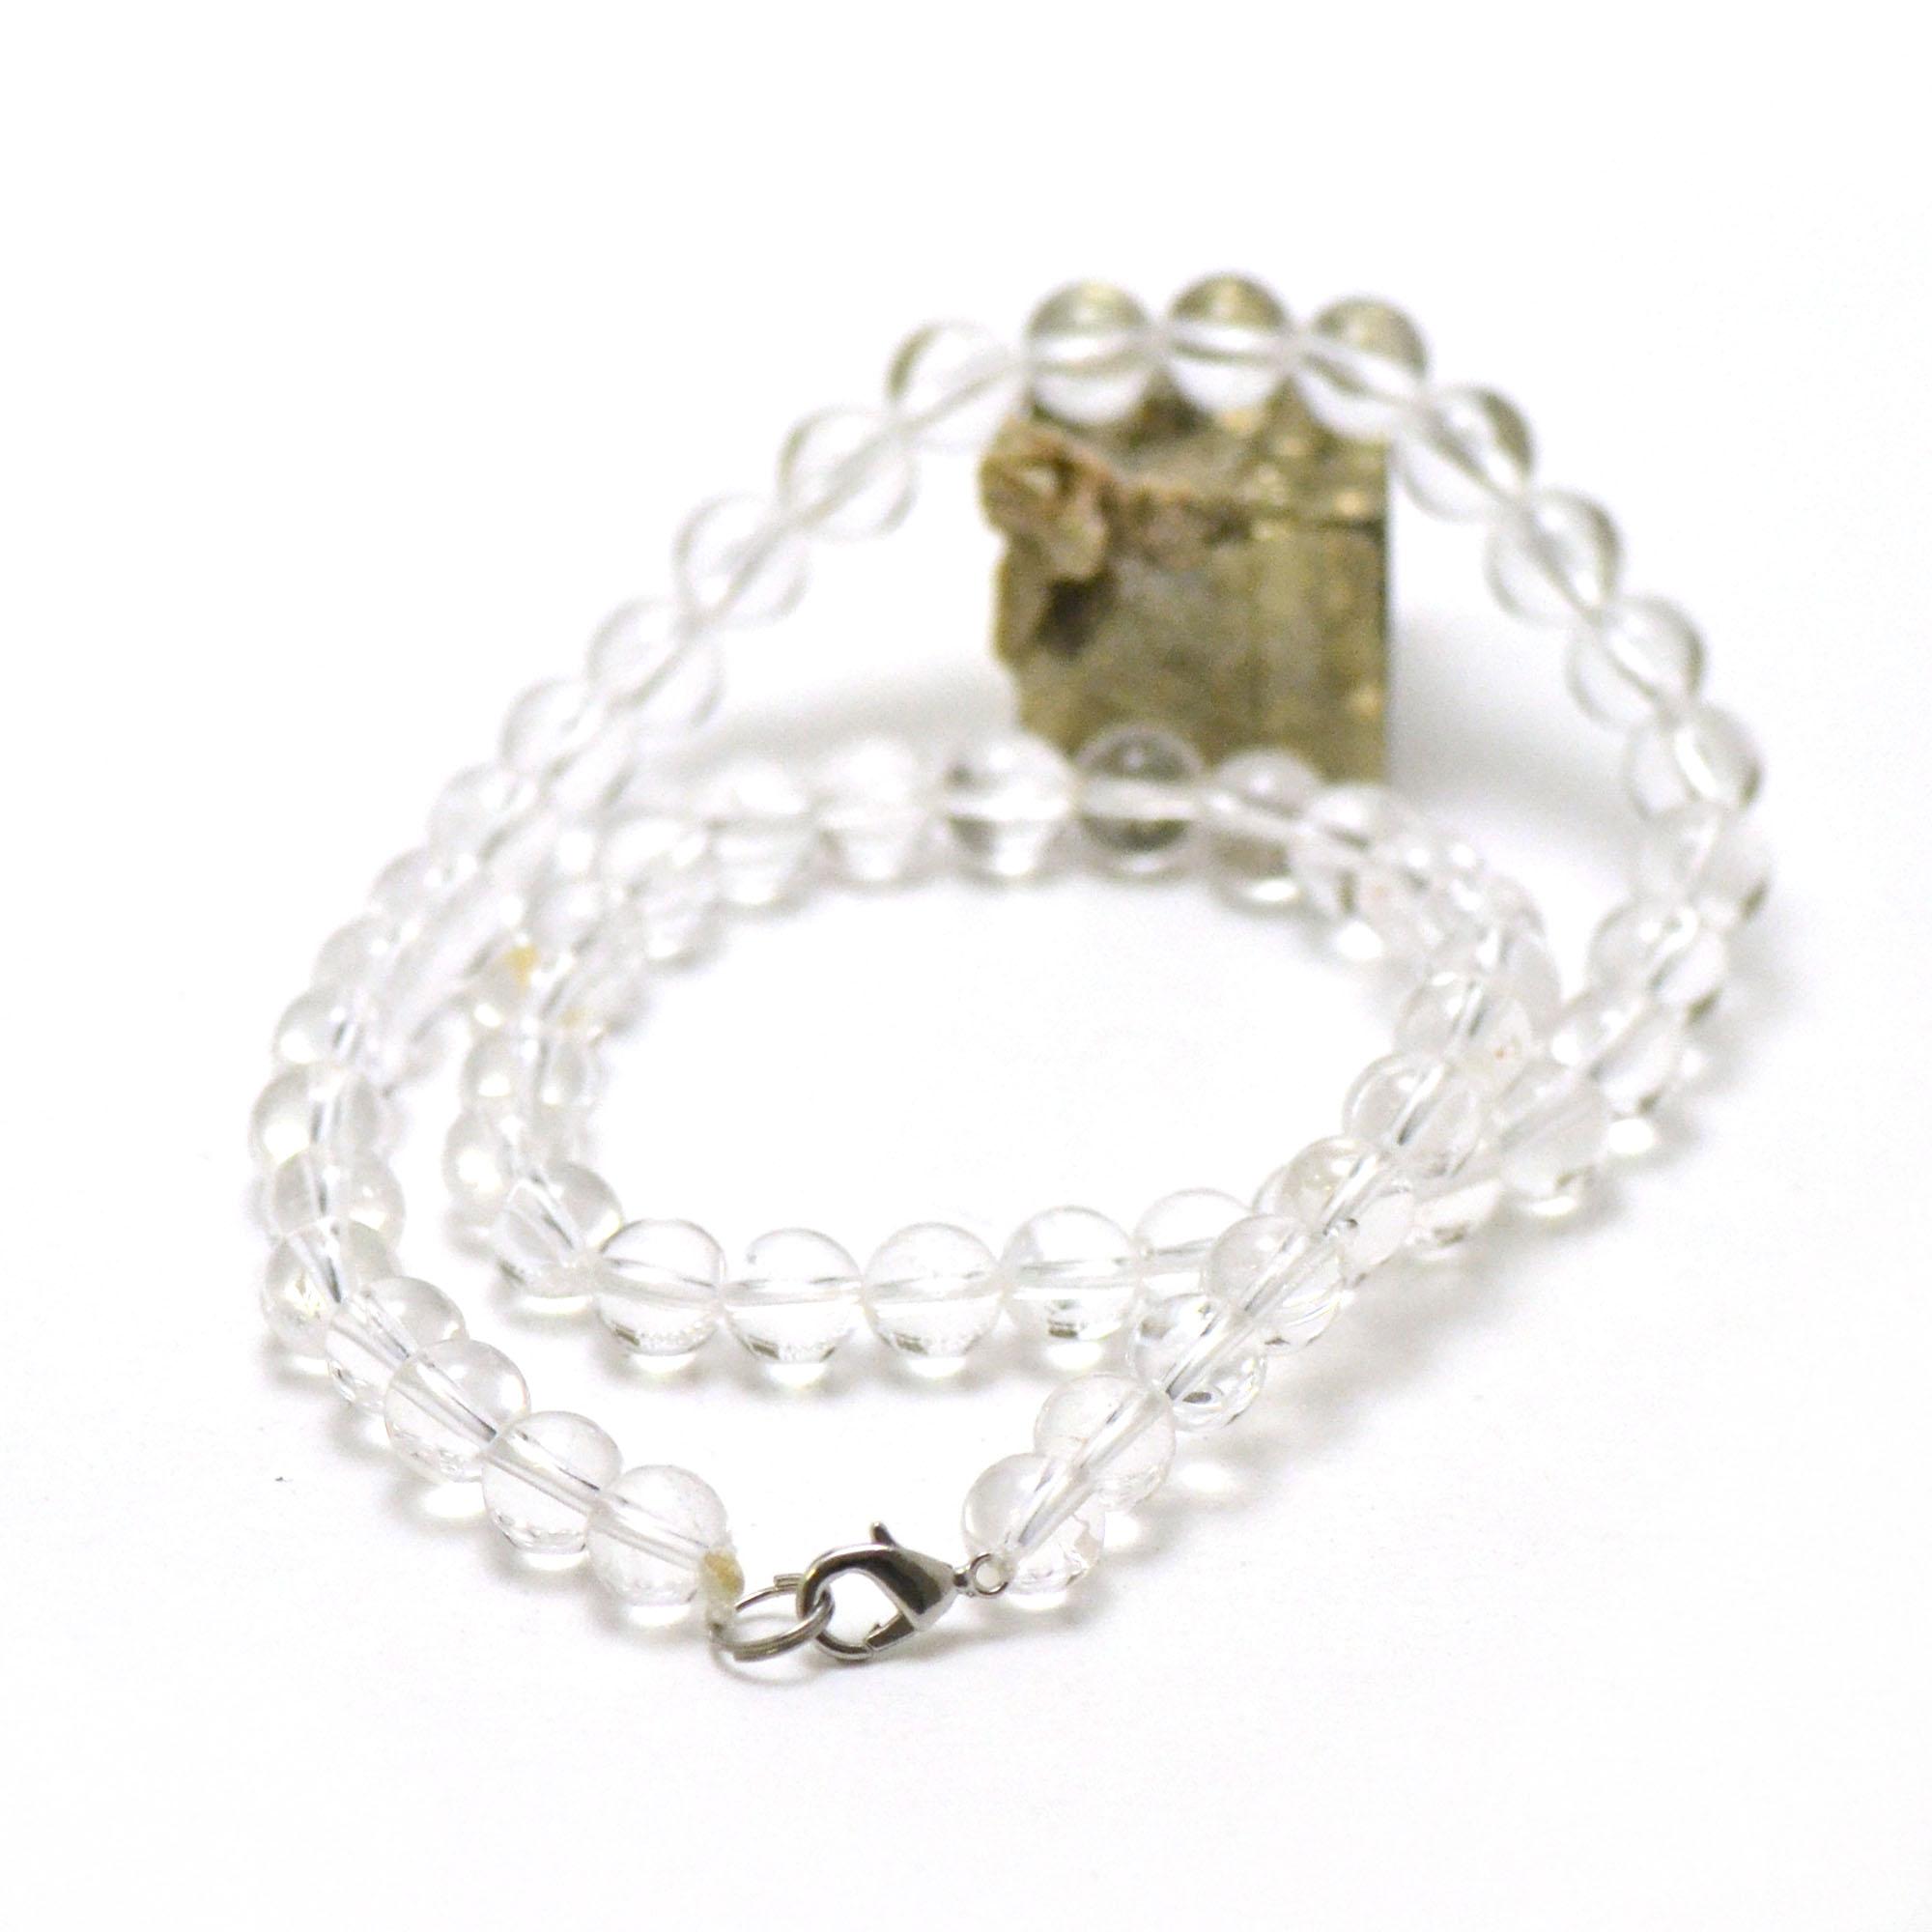 Collier cristal de roche, perle ronde 8 mm